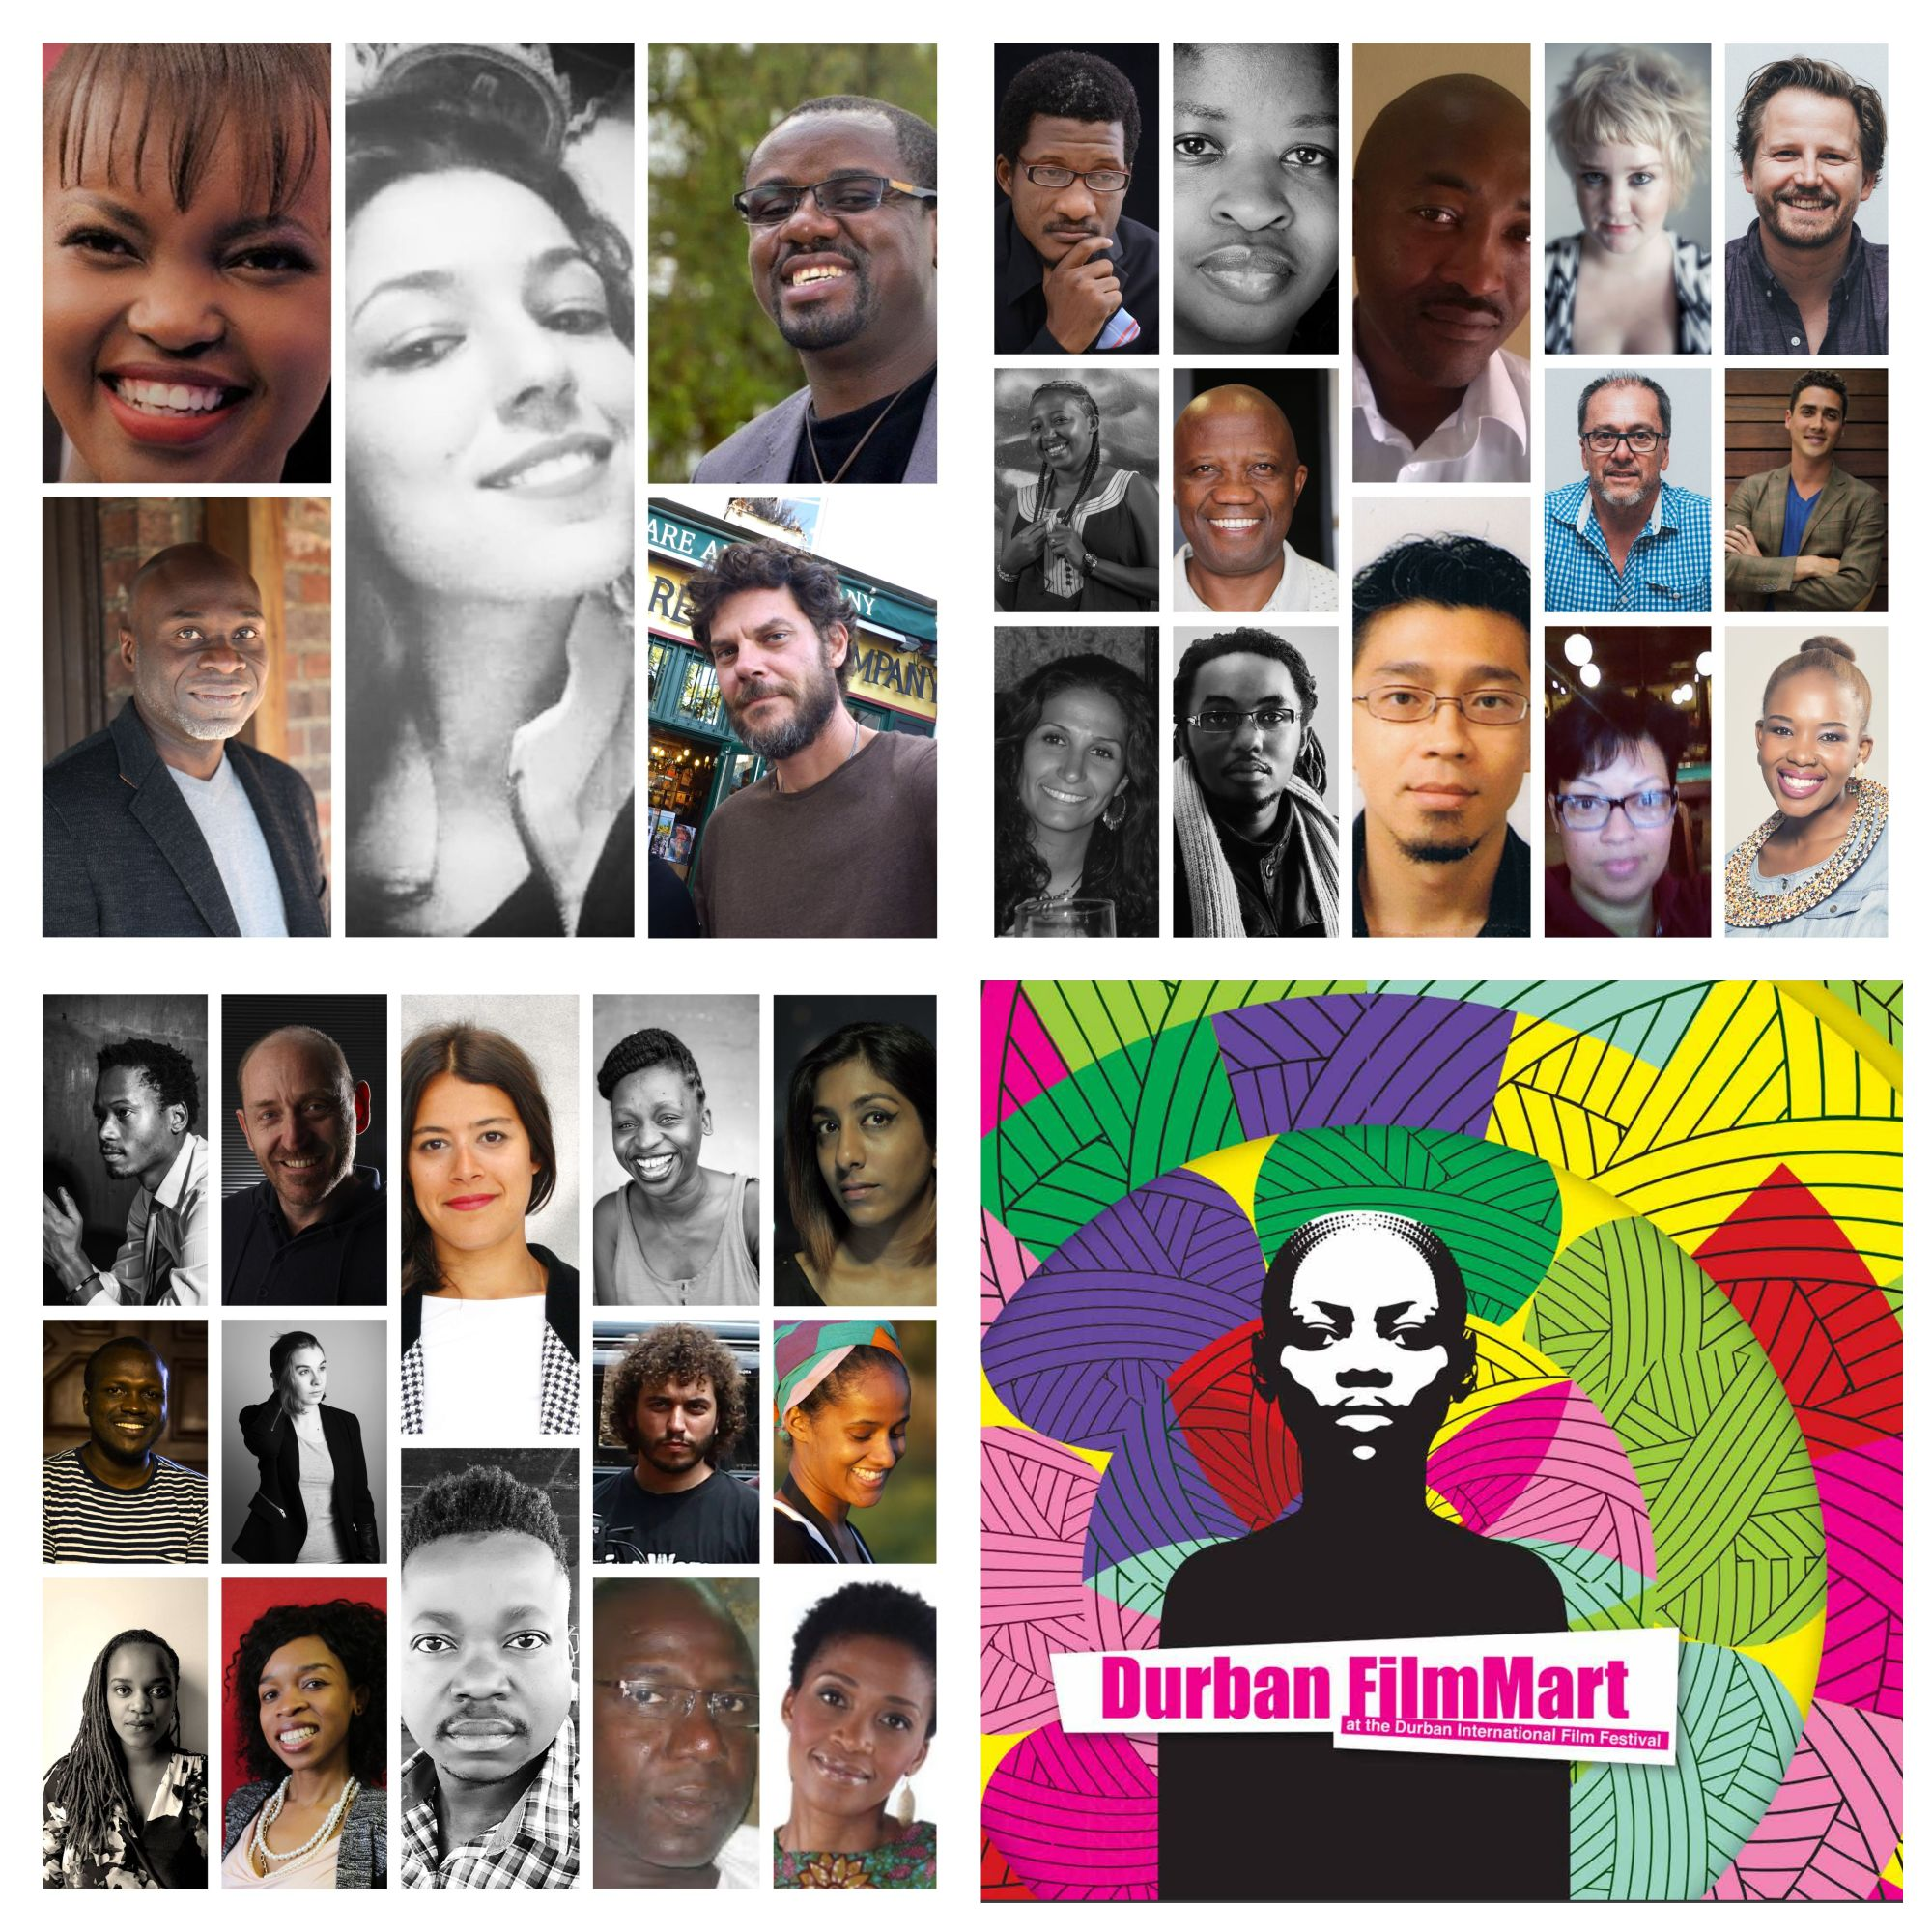 2017 Durban FilmMart (DFM)